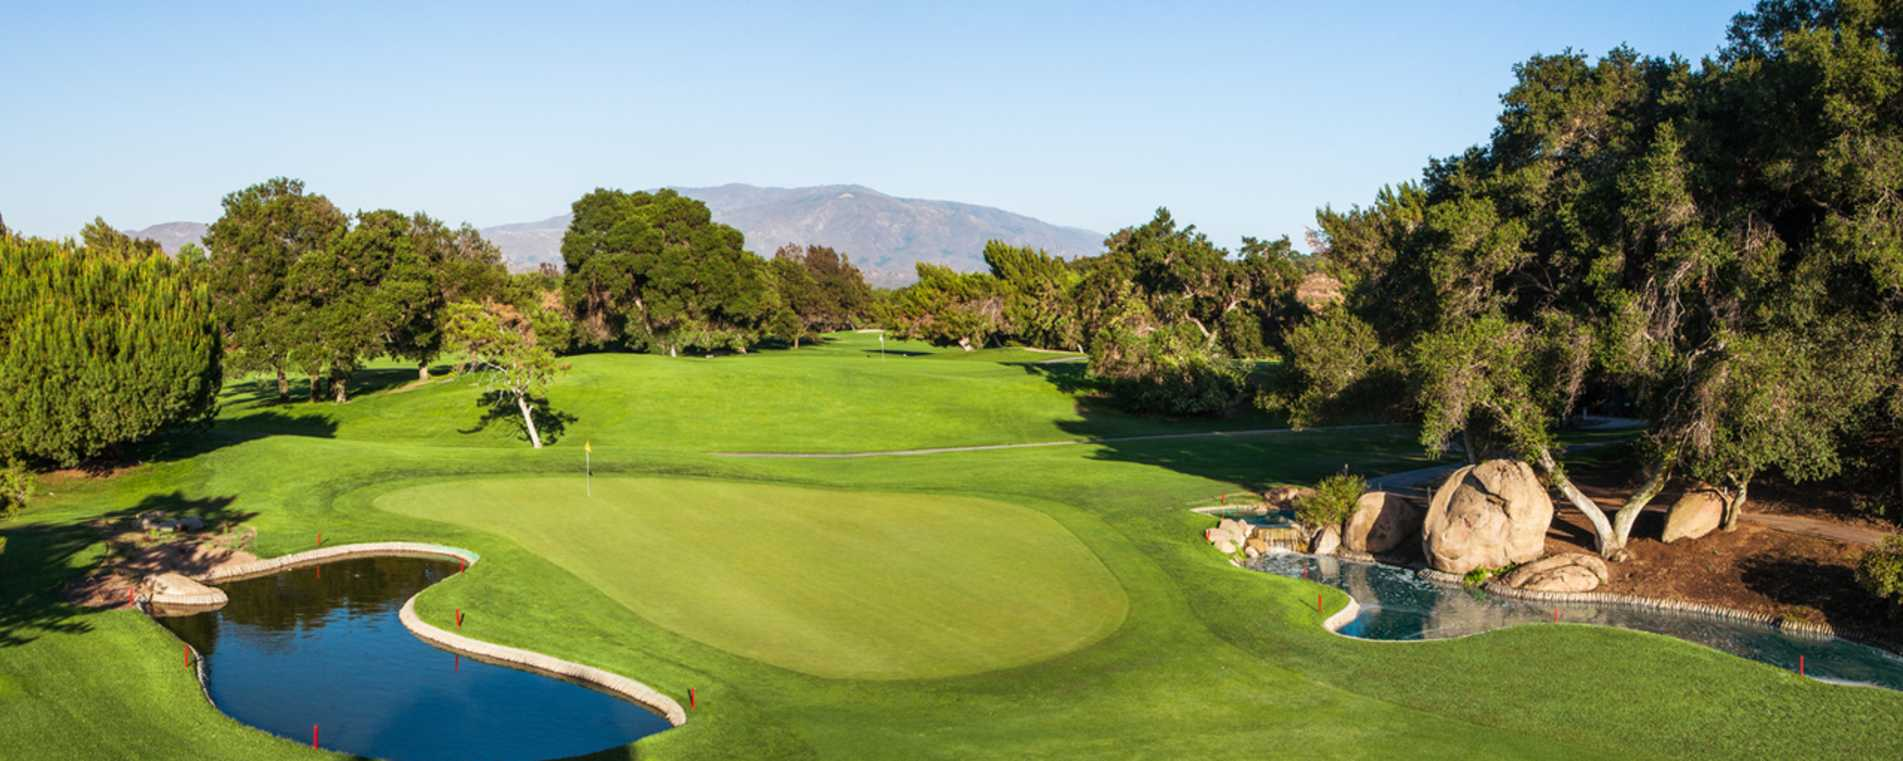 Golf Course - Temecula Creek Inn